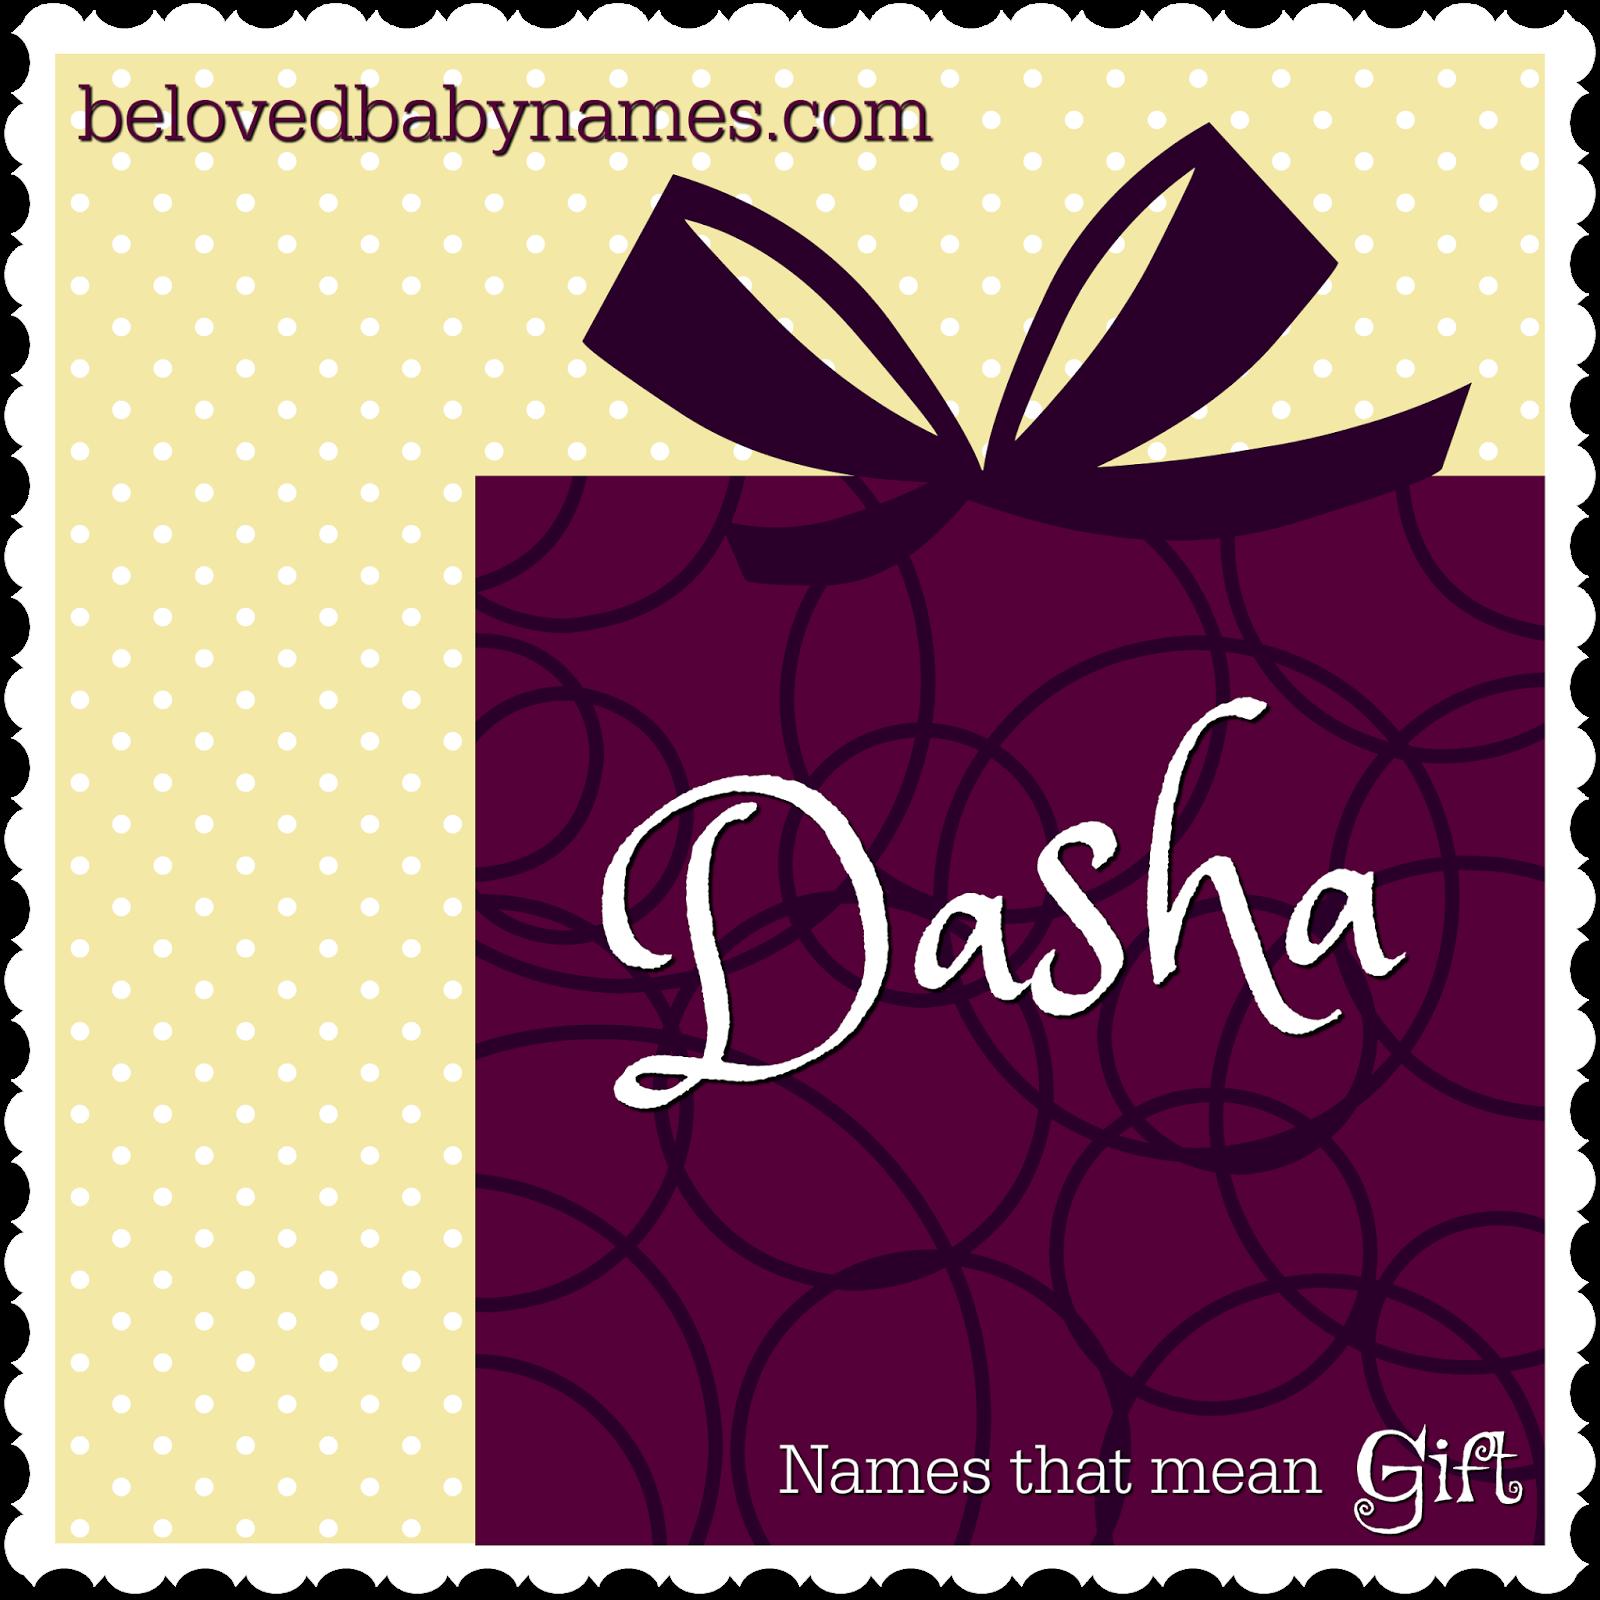 Beloved baby names naming. Pilgrims clipart mayflower